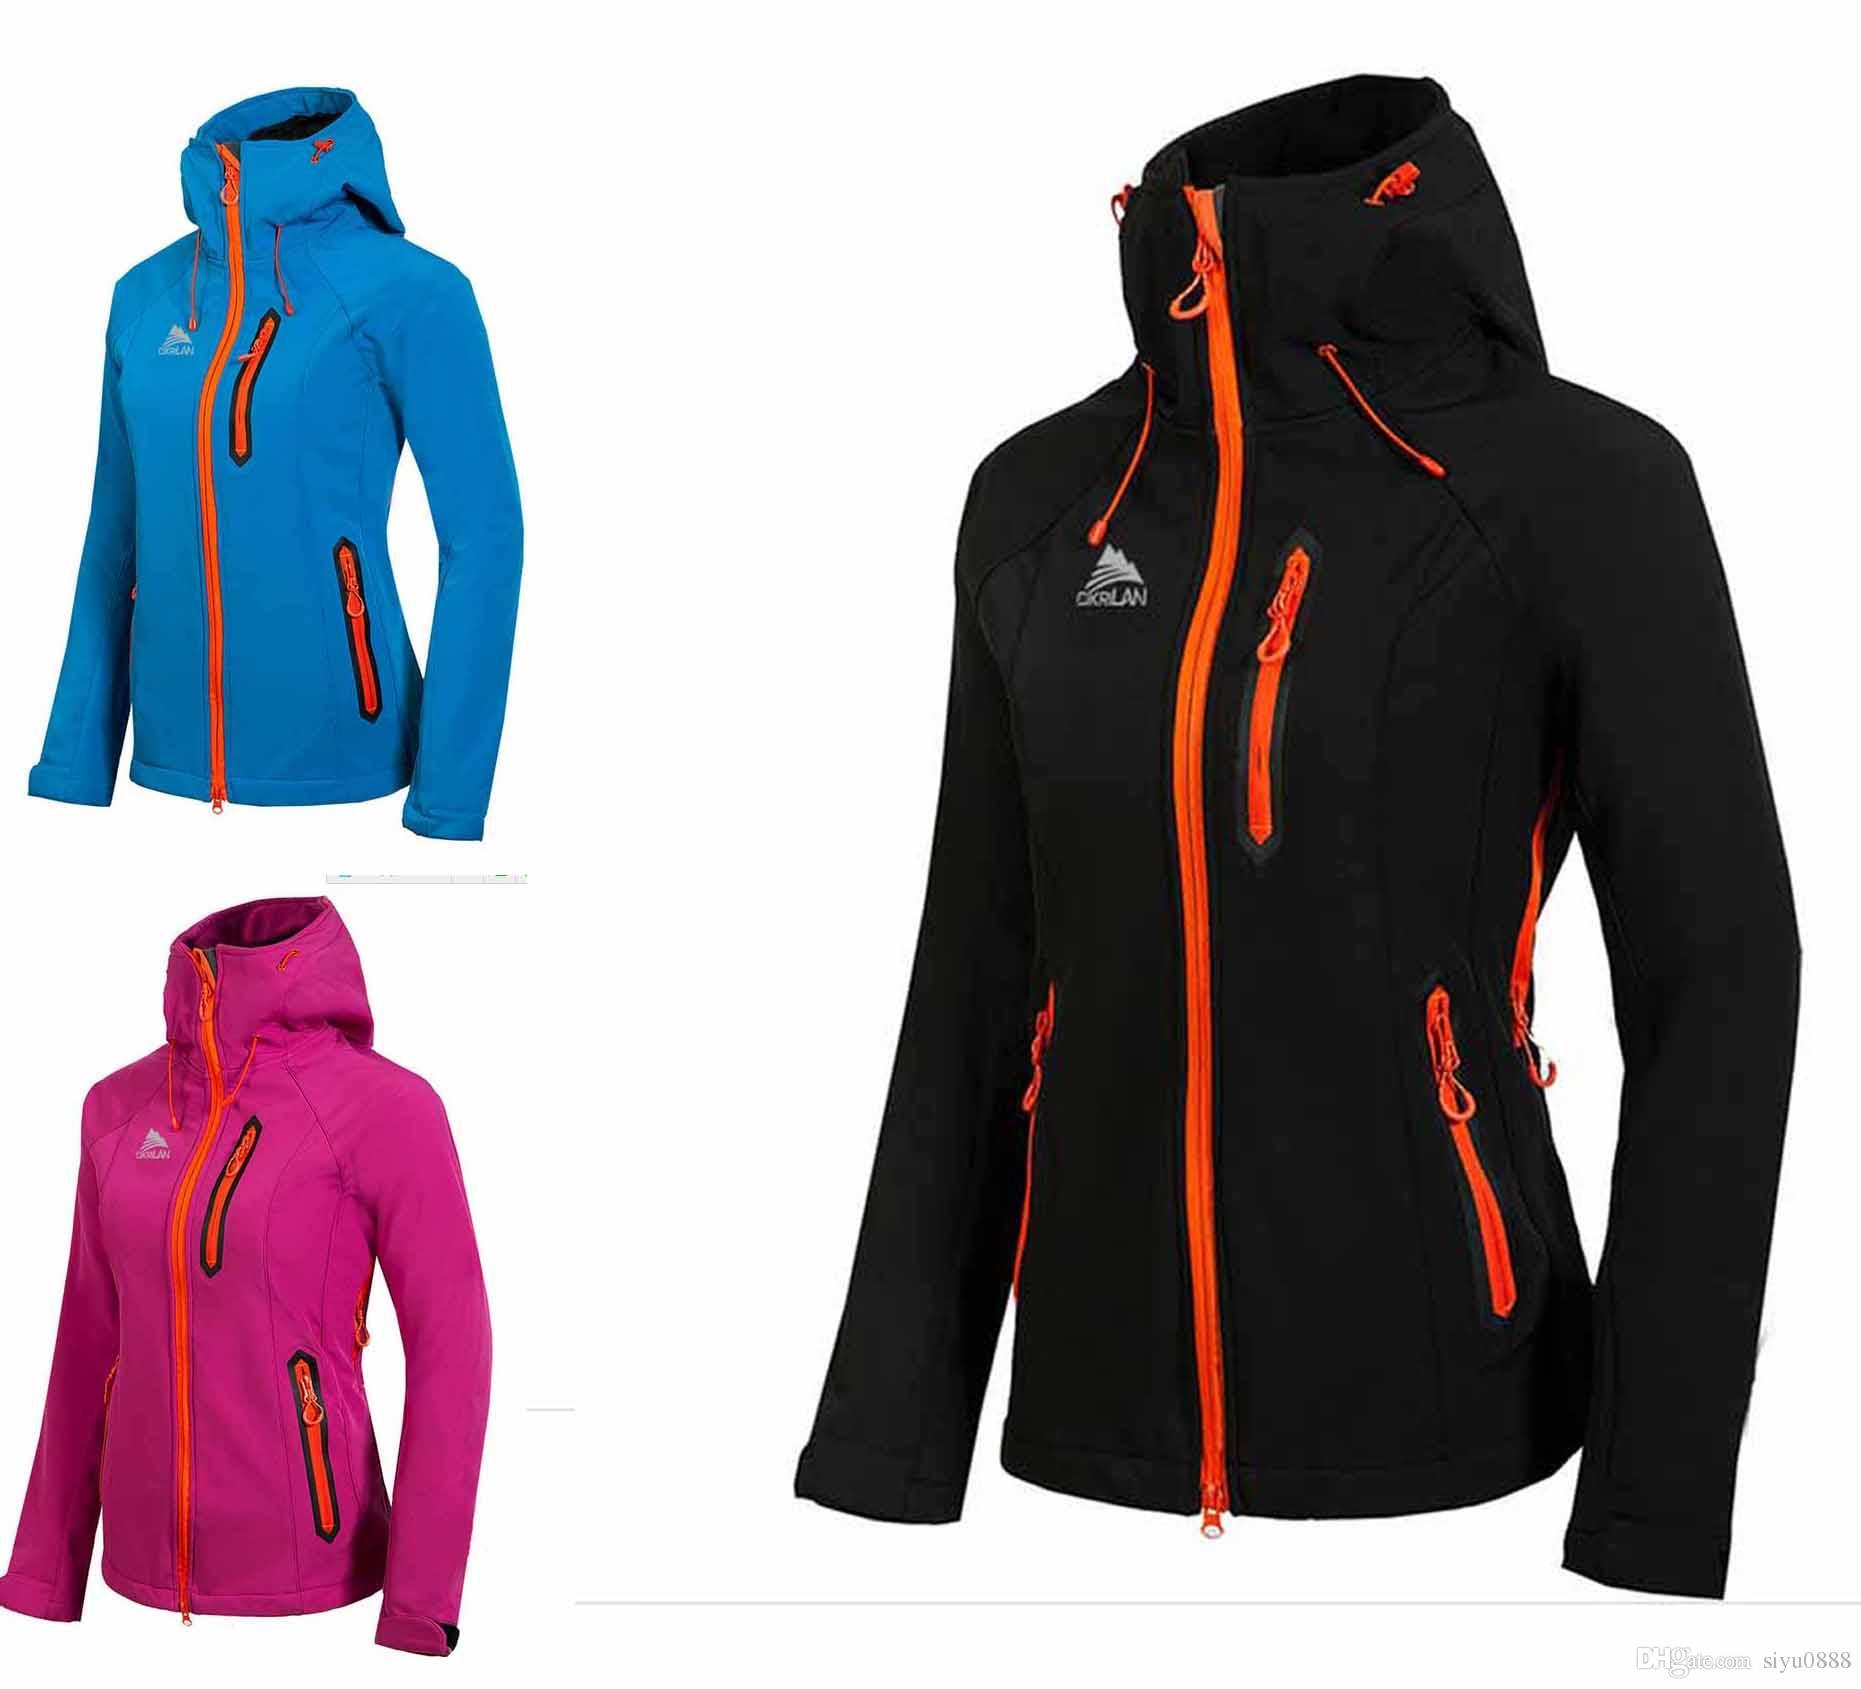 Großhandel 2017 NEUE Softshell Polartec Sportjacke Damen Frauen Verkäufe Fleece Apex Bionic Winddicht Wasserdicht Atmungsaktiv Gesicht Outdoor Mäntel